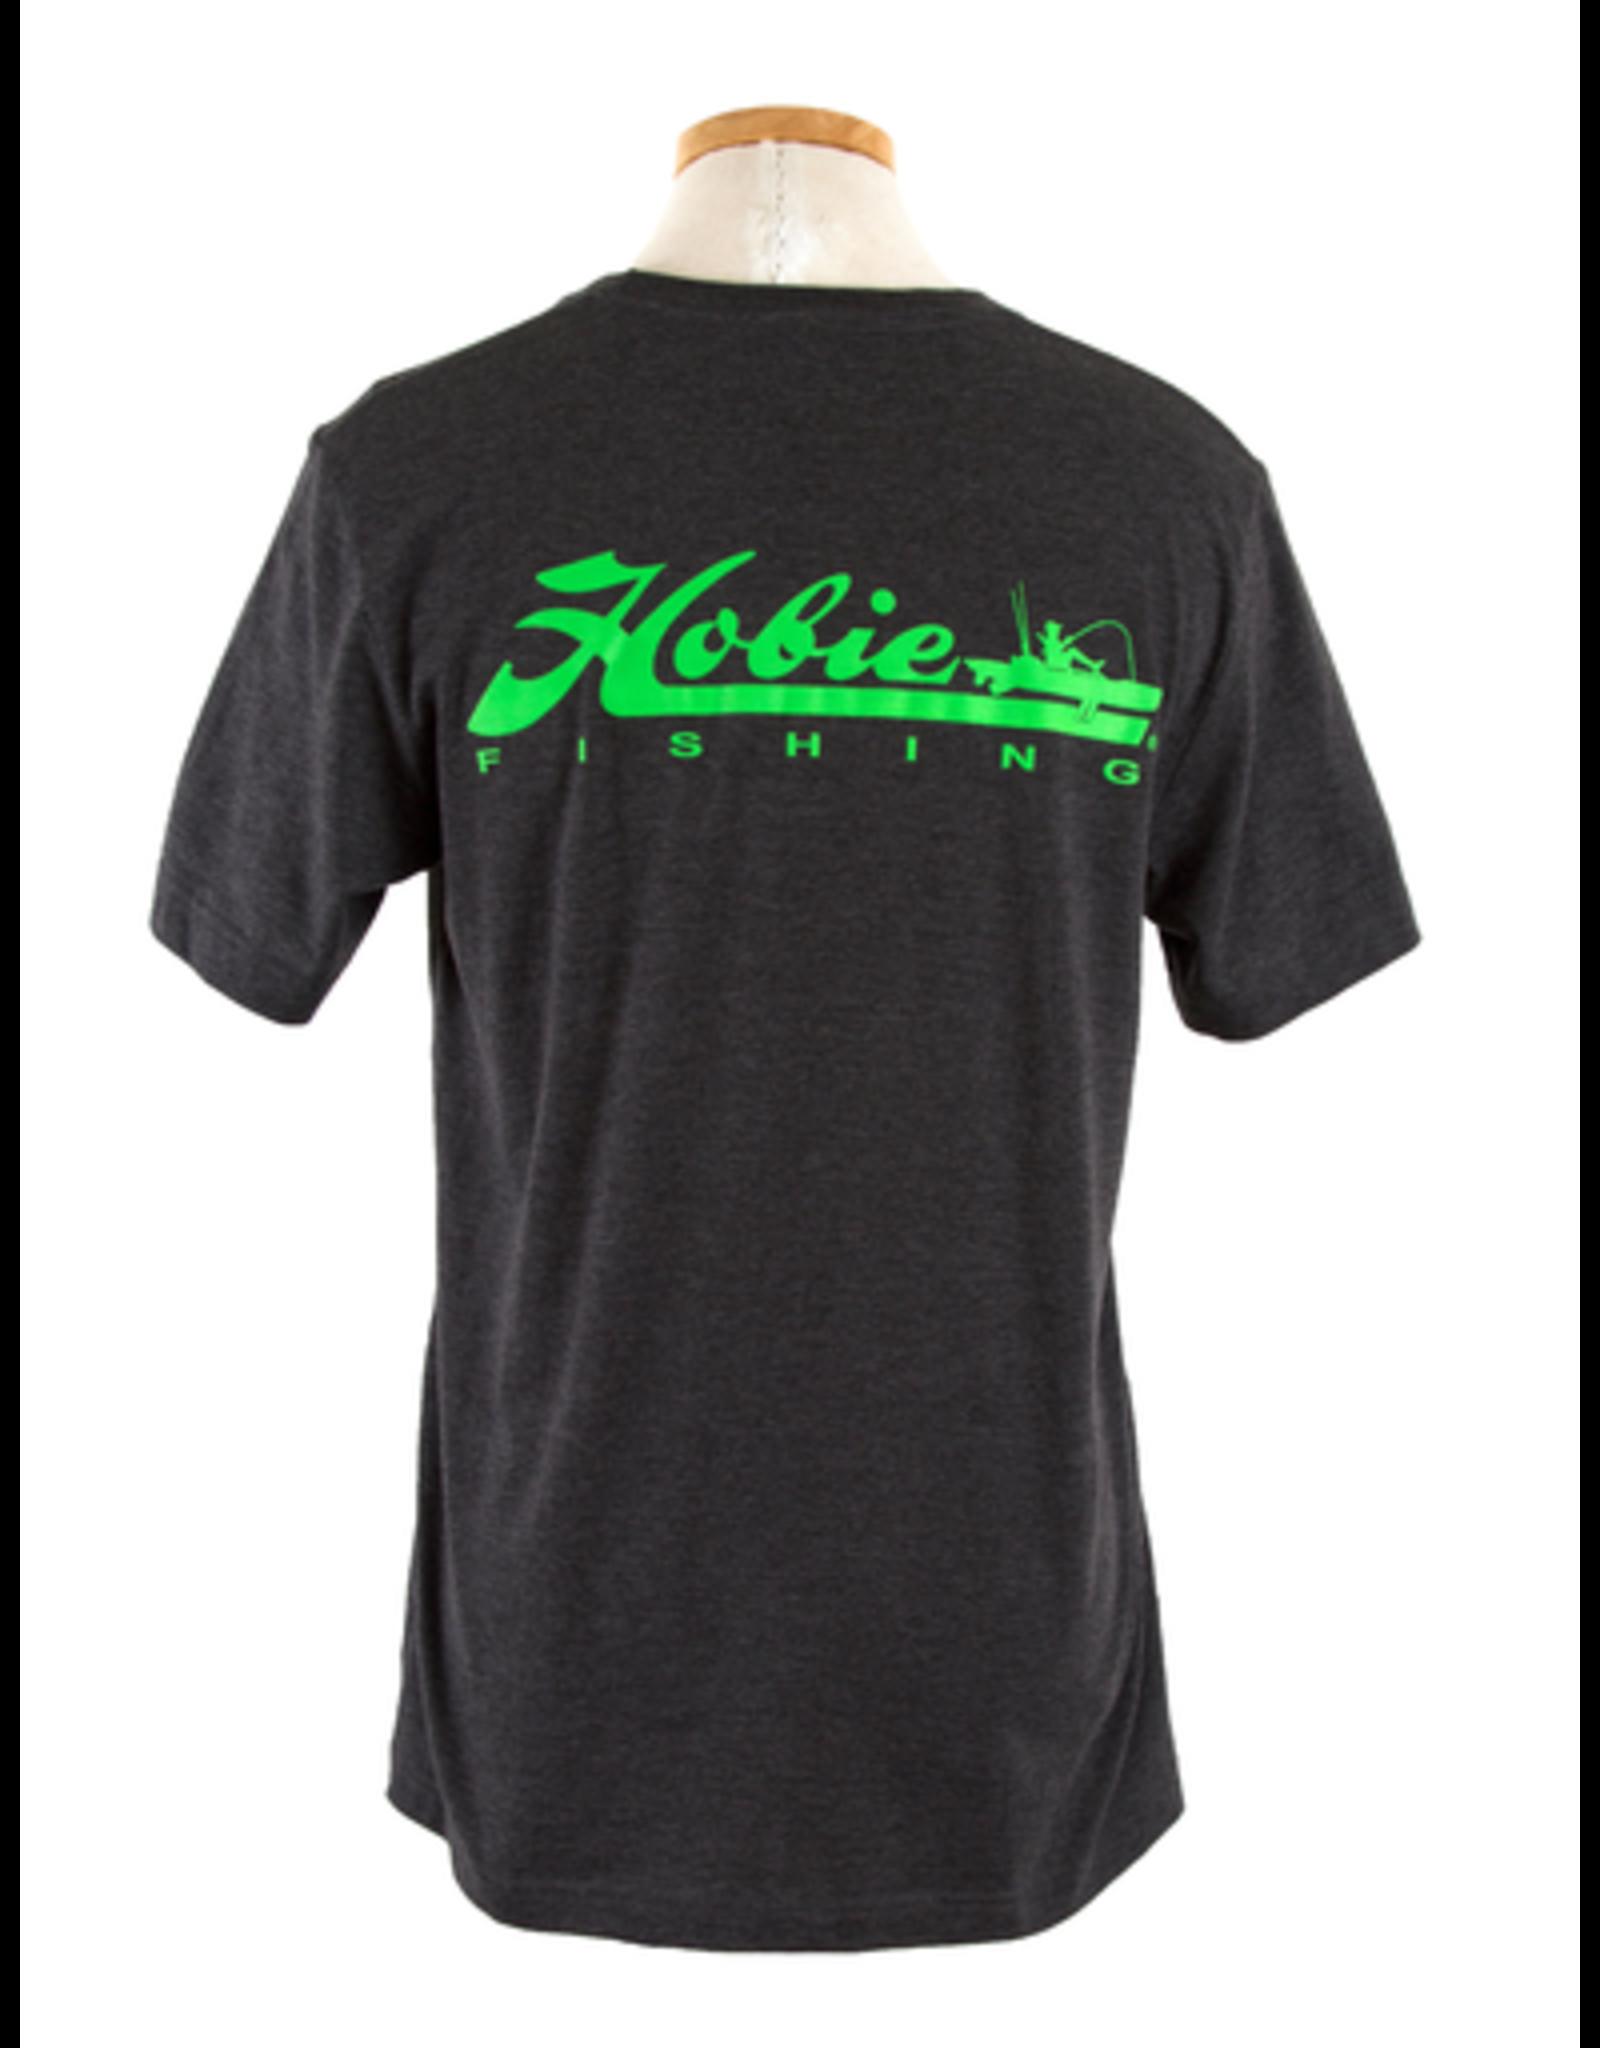 Hobie Hobie Charcoal T-Shirt, Short Sleeve, Hobie Fishing Logo in Lime